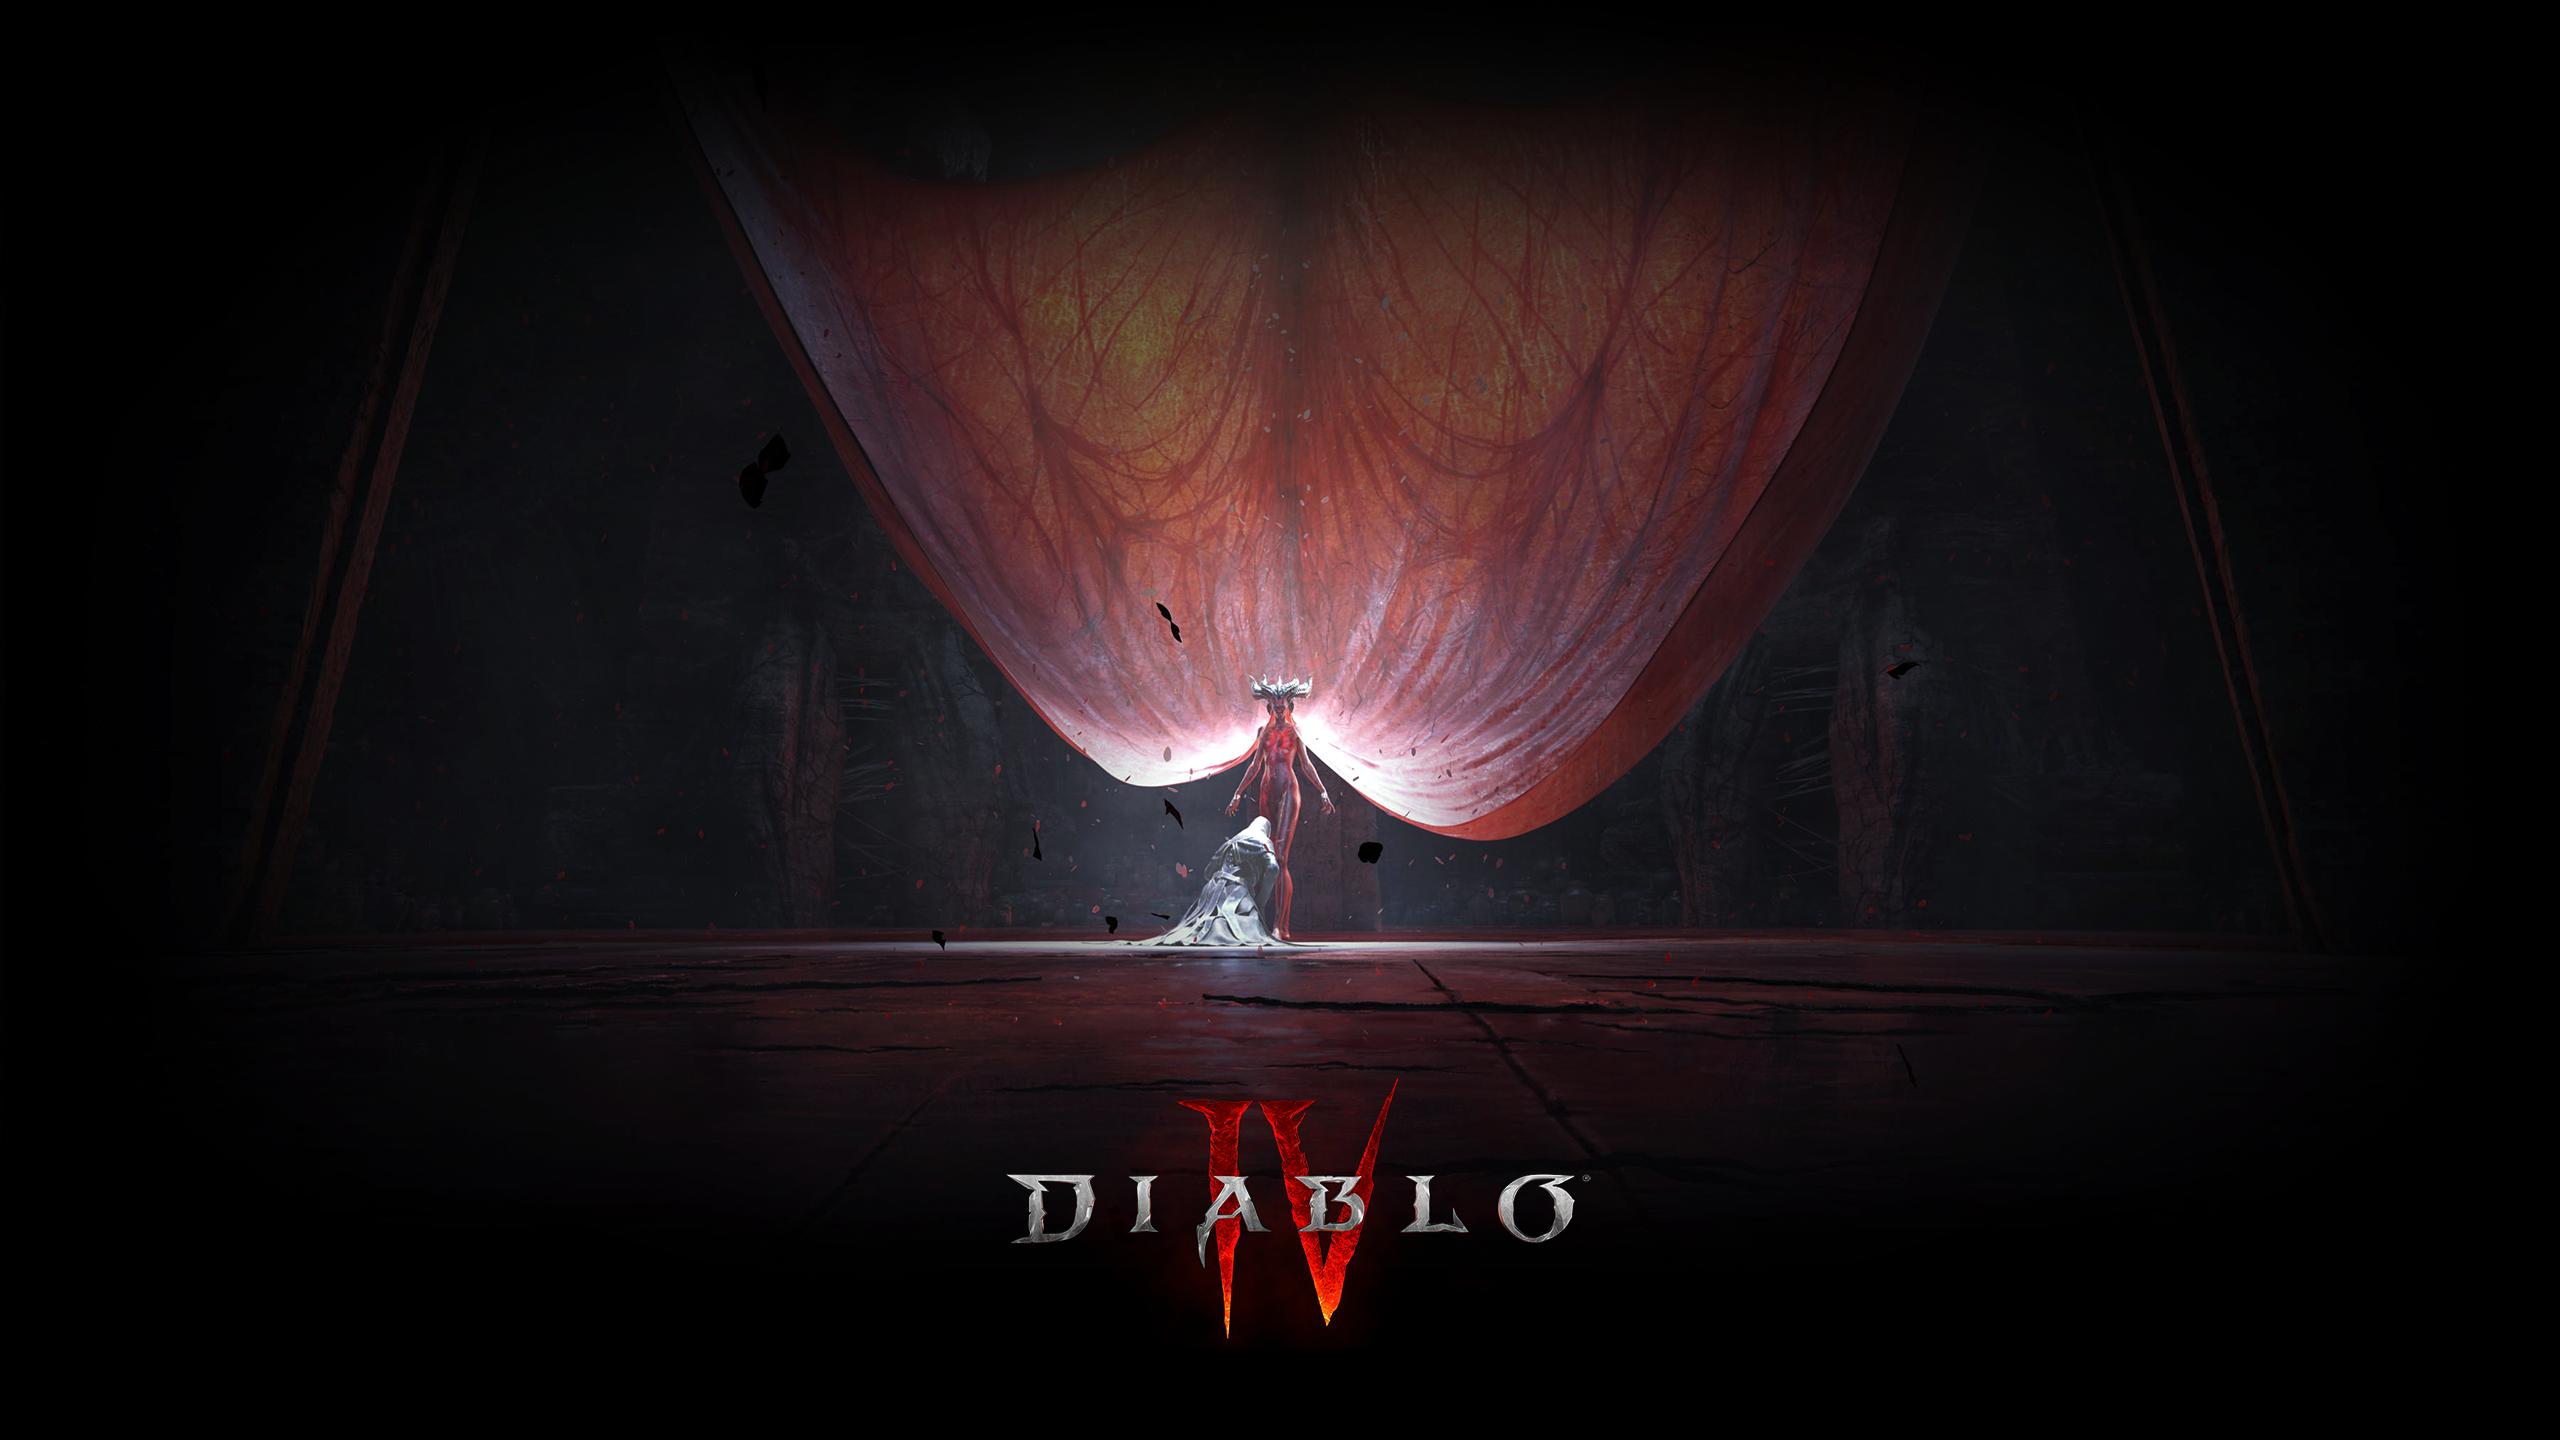 General 2560x1440 Diablo diablo iv diablo 4